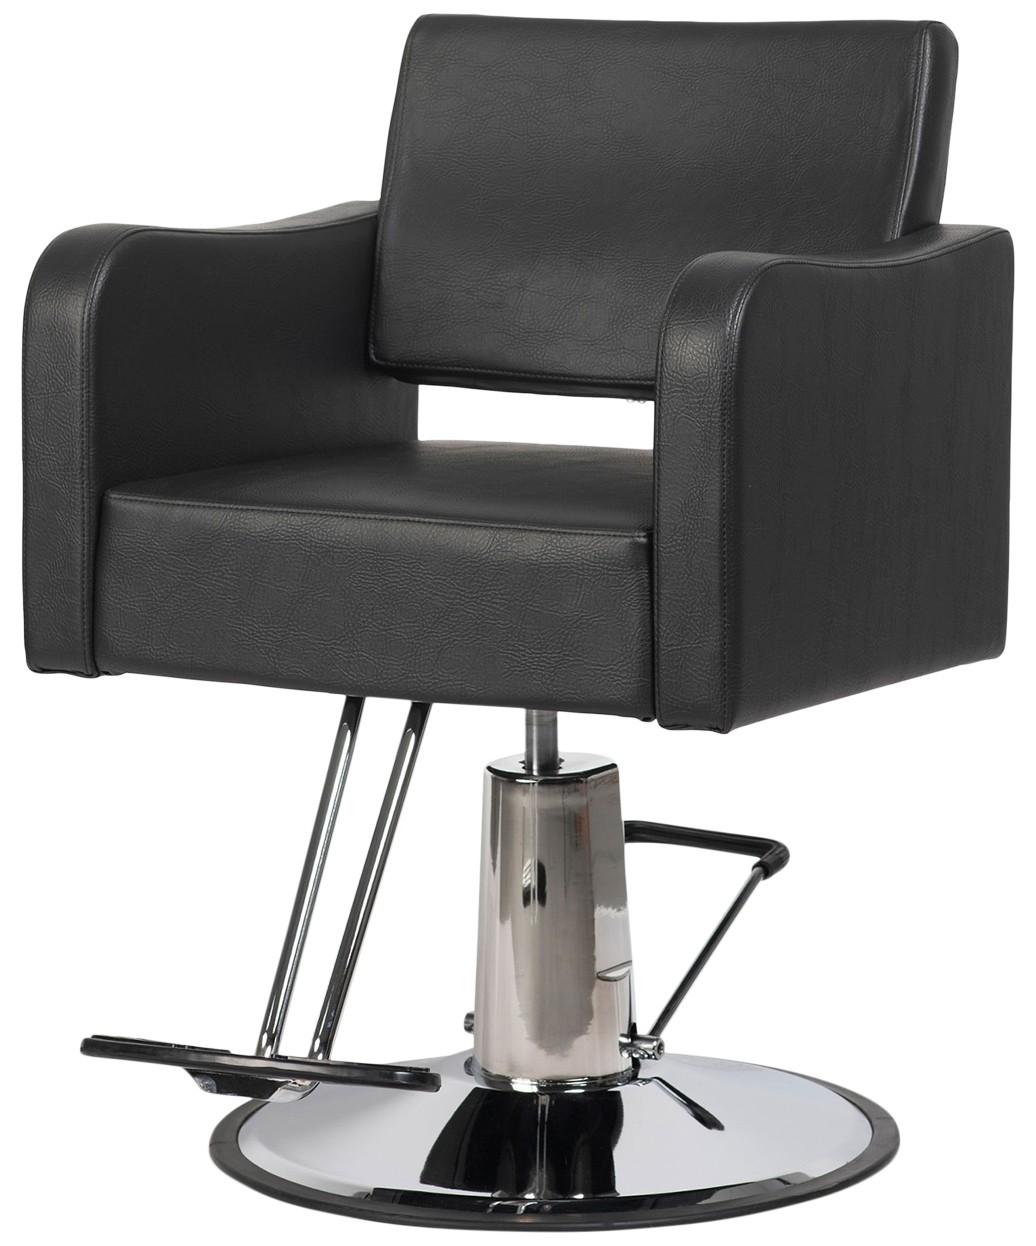 Lexus Styling Chair